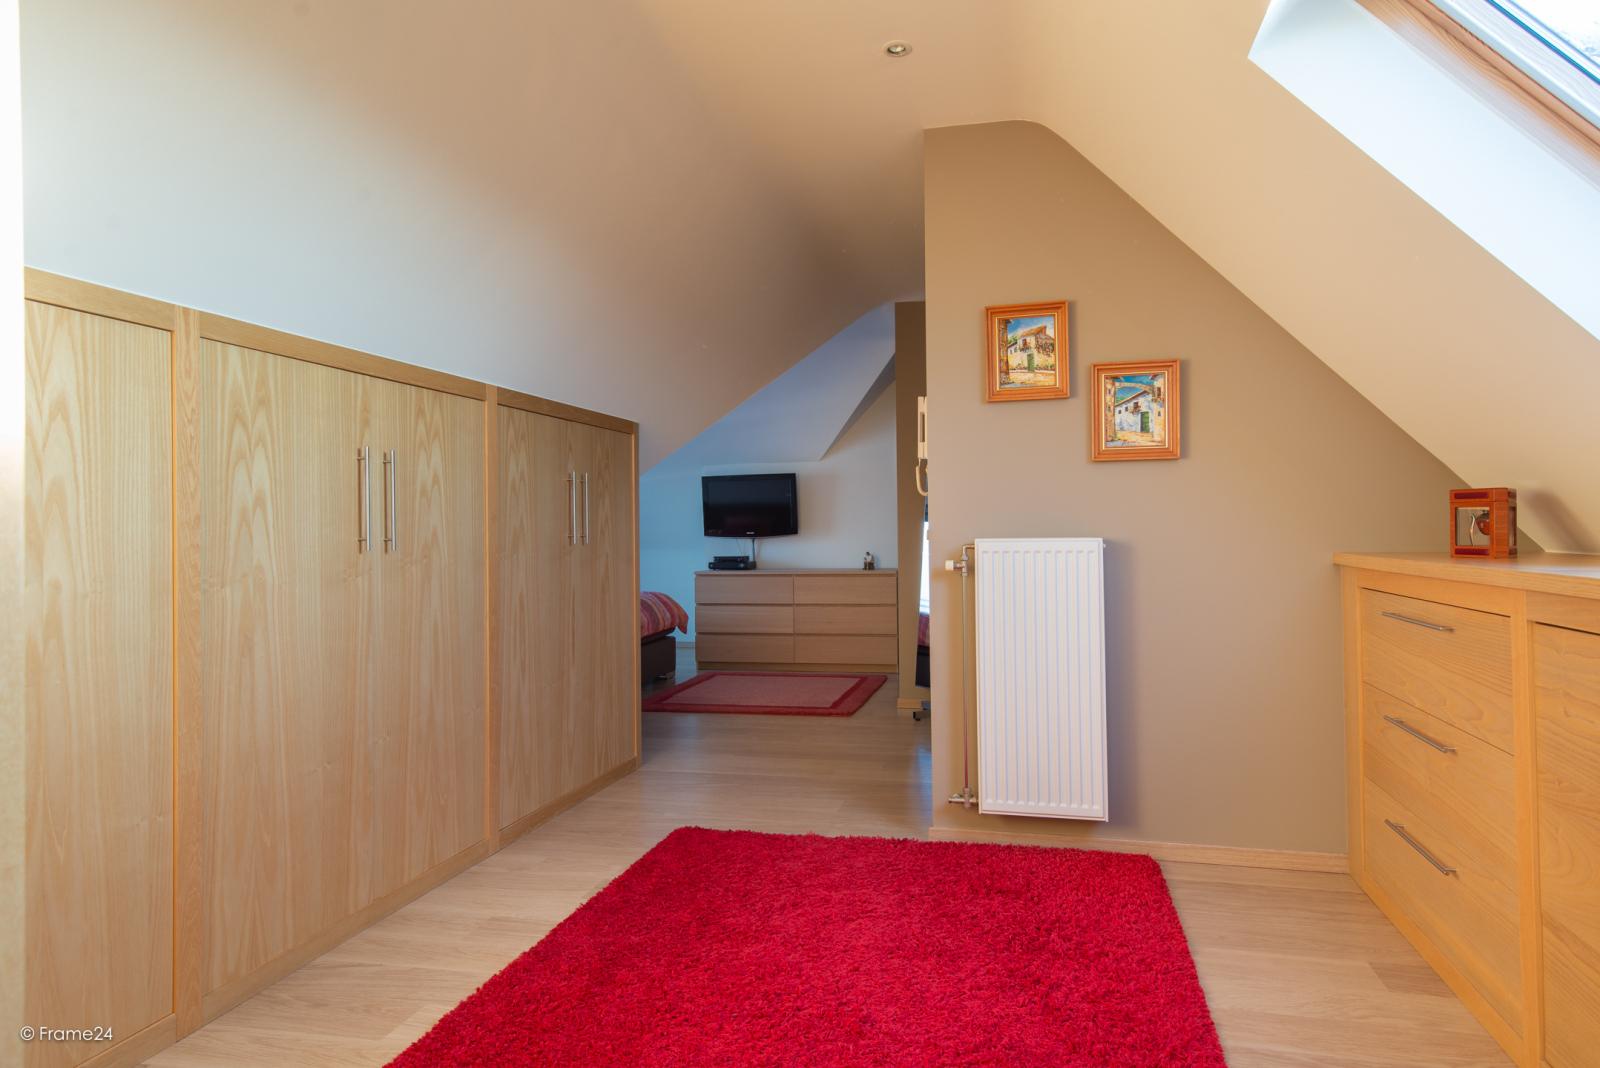 Riant dakappartement (130 m²) met zonnig terras in residentie 'Eyserhof' te Wijnegem! afbeelding 21